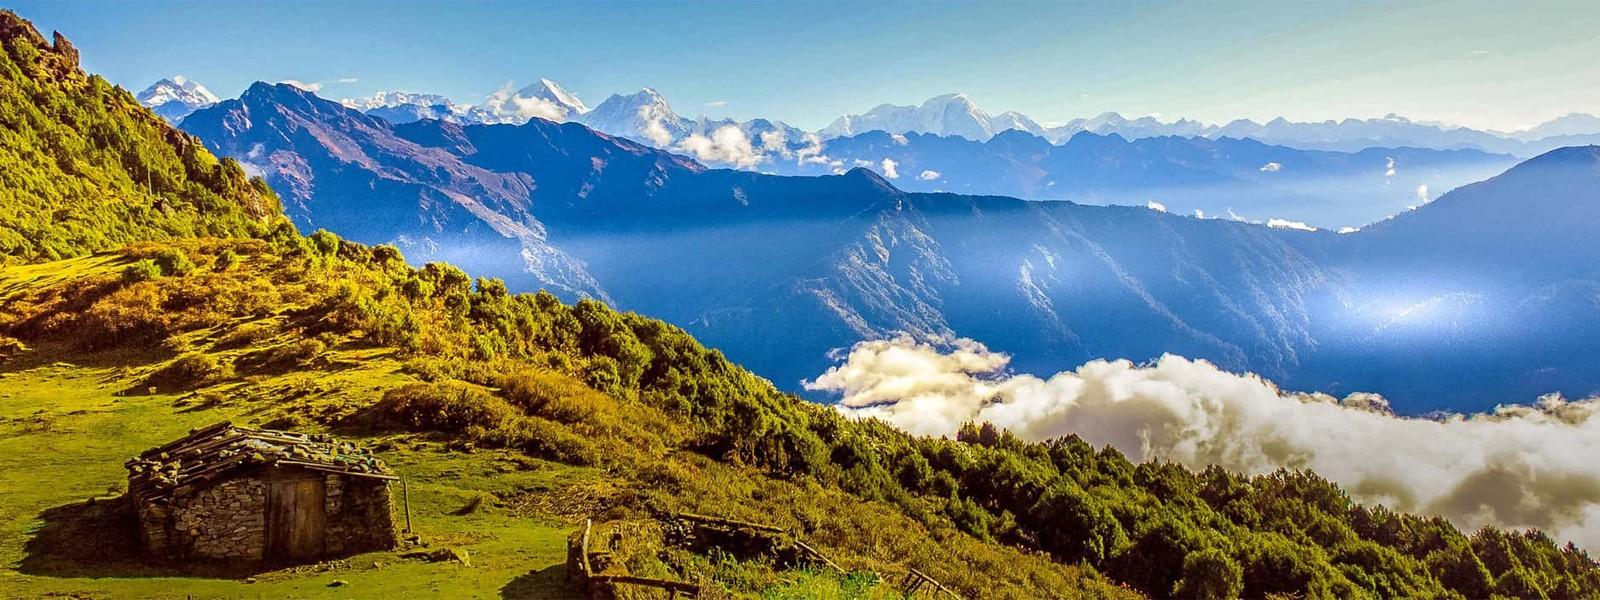 Shivapuri, Chisopani and Nagarkot Trek